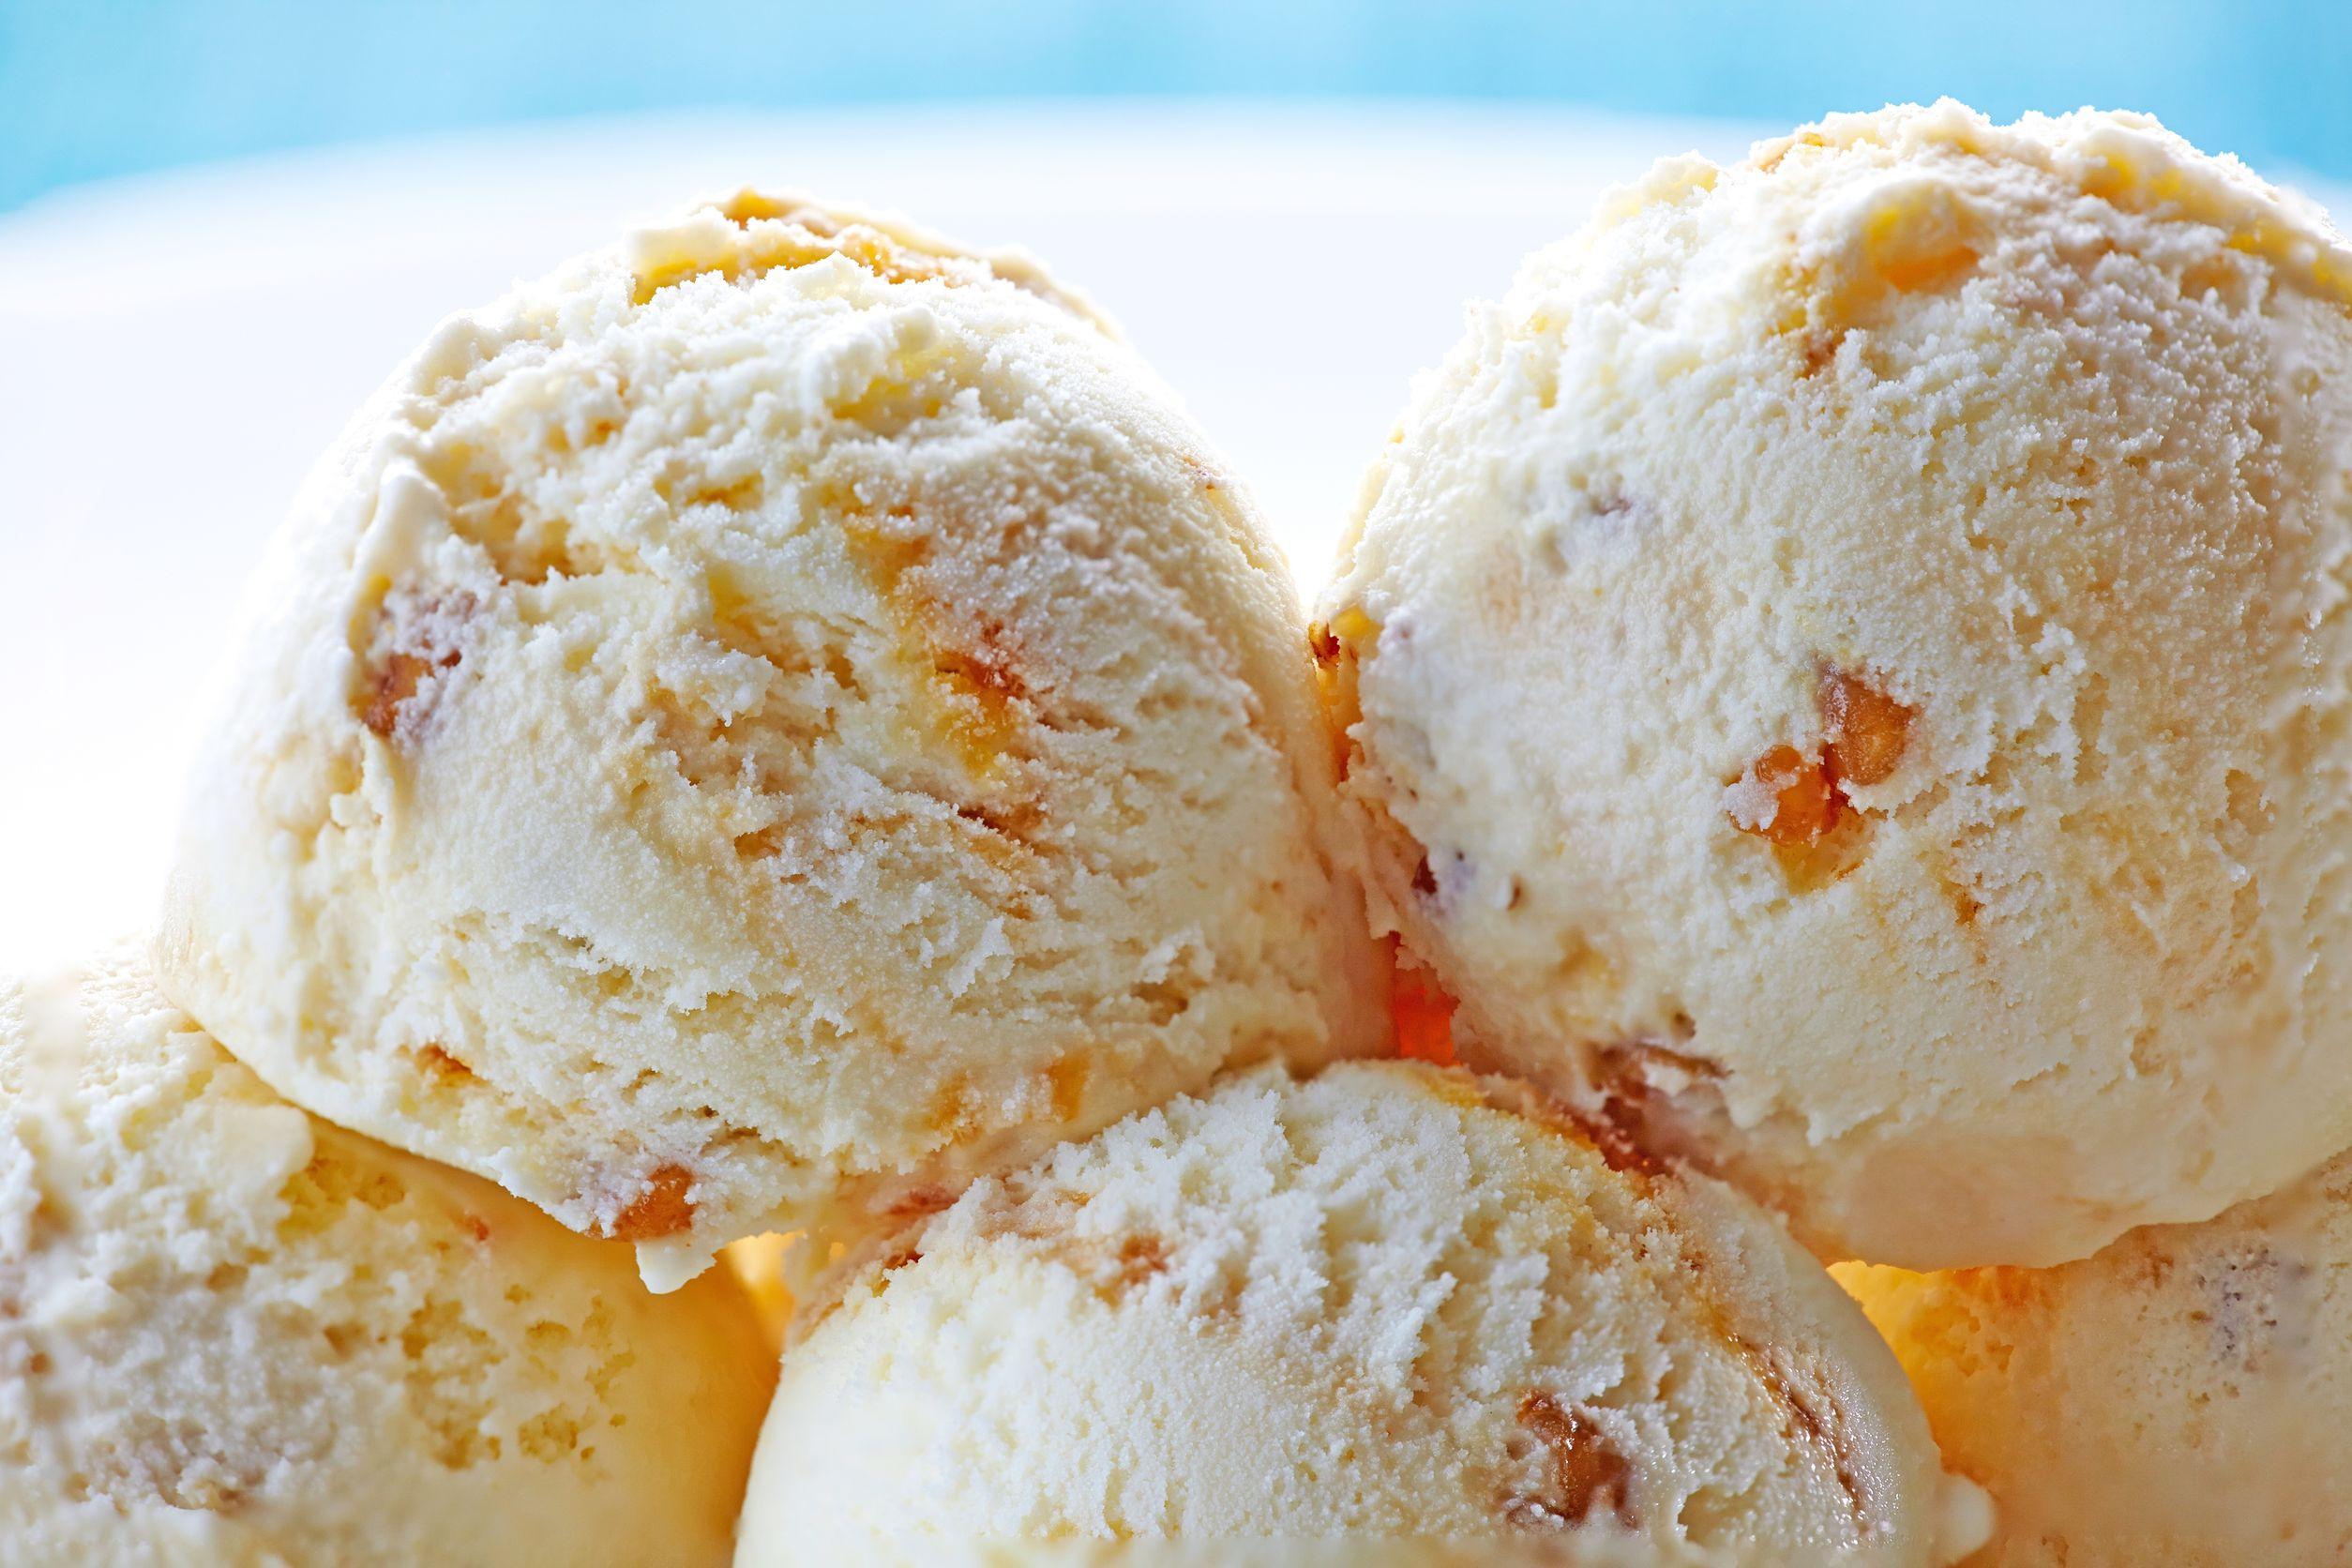 new zealand vanilla ice cream 123rf